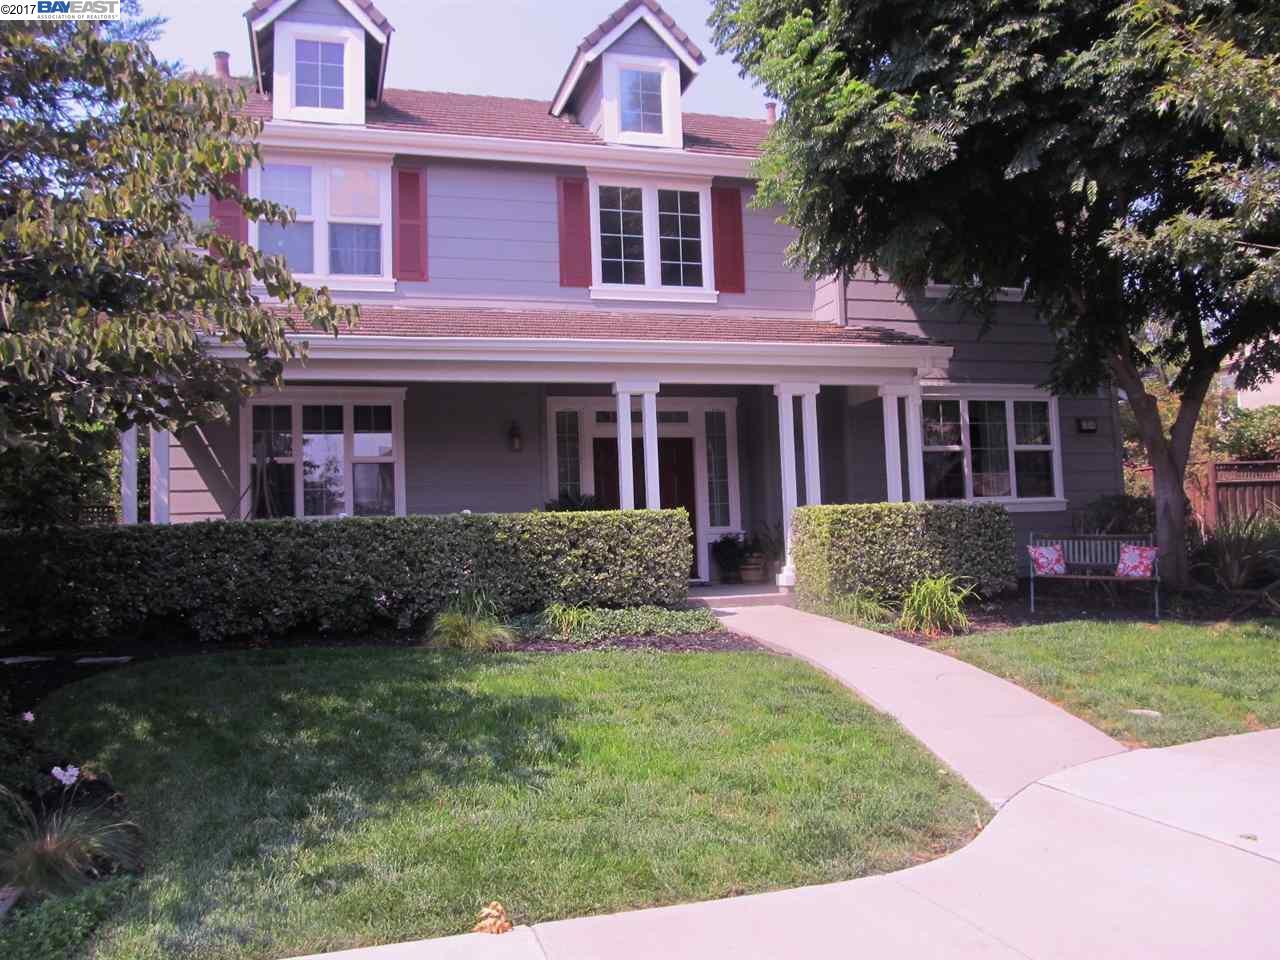 واحد منزل الأسرة للـ Sale في 2450 REES CIRCLE 2450 REES CIRCLE Livermore, California 94550 United States